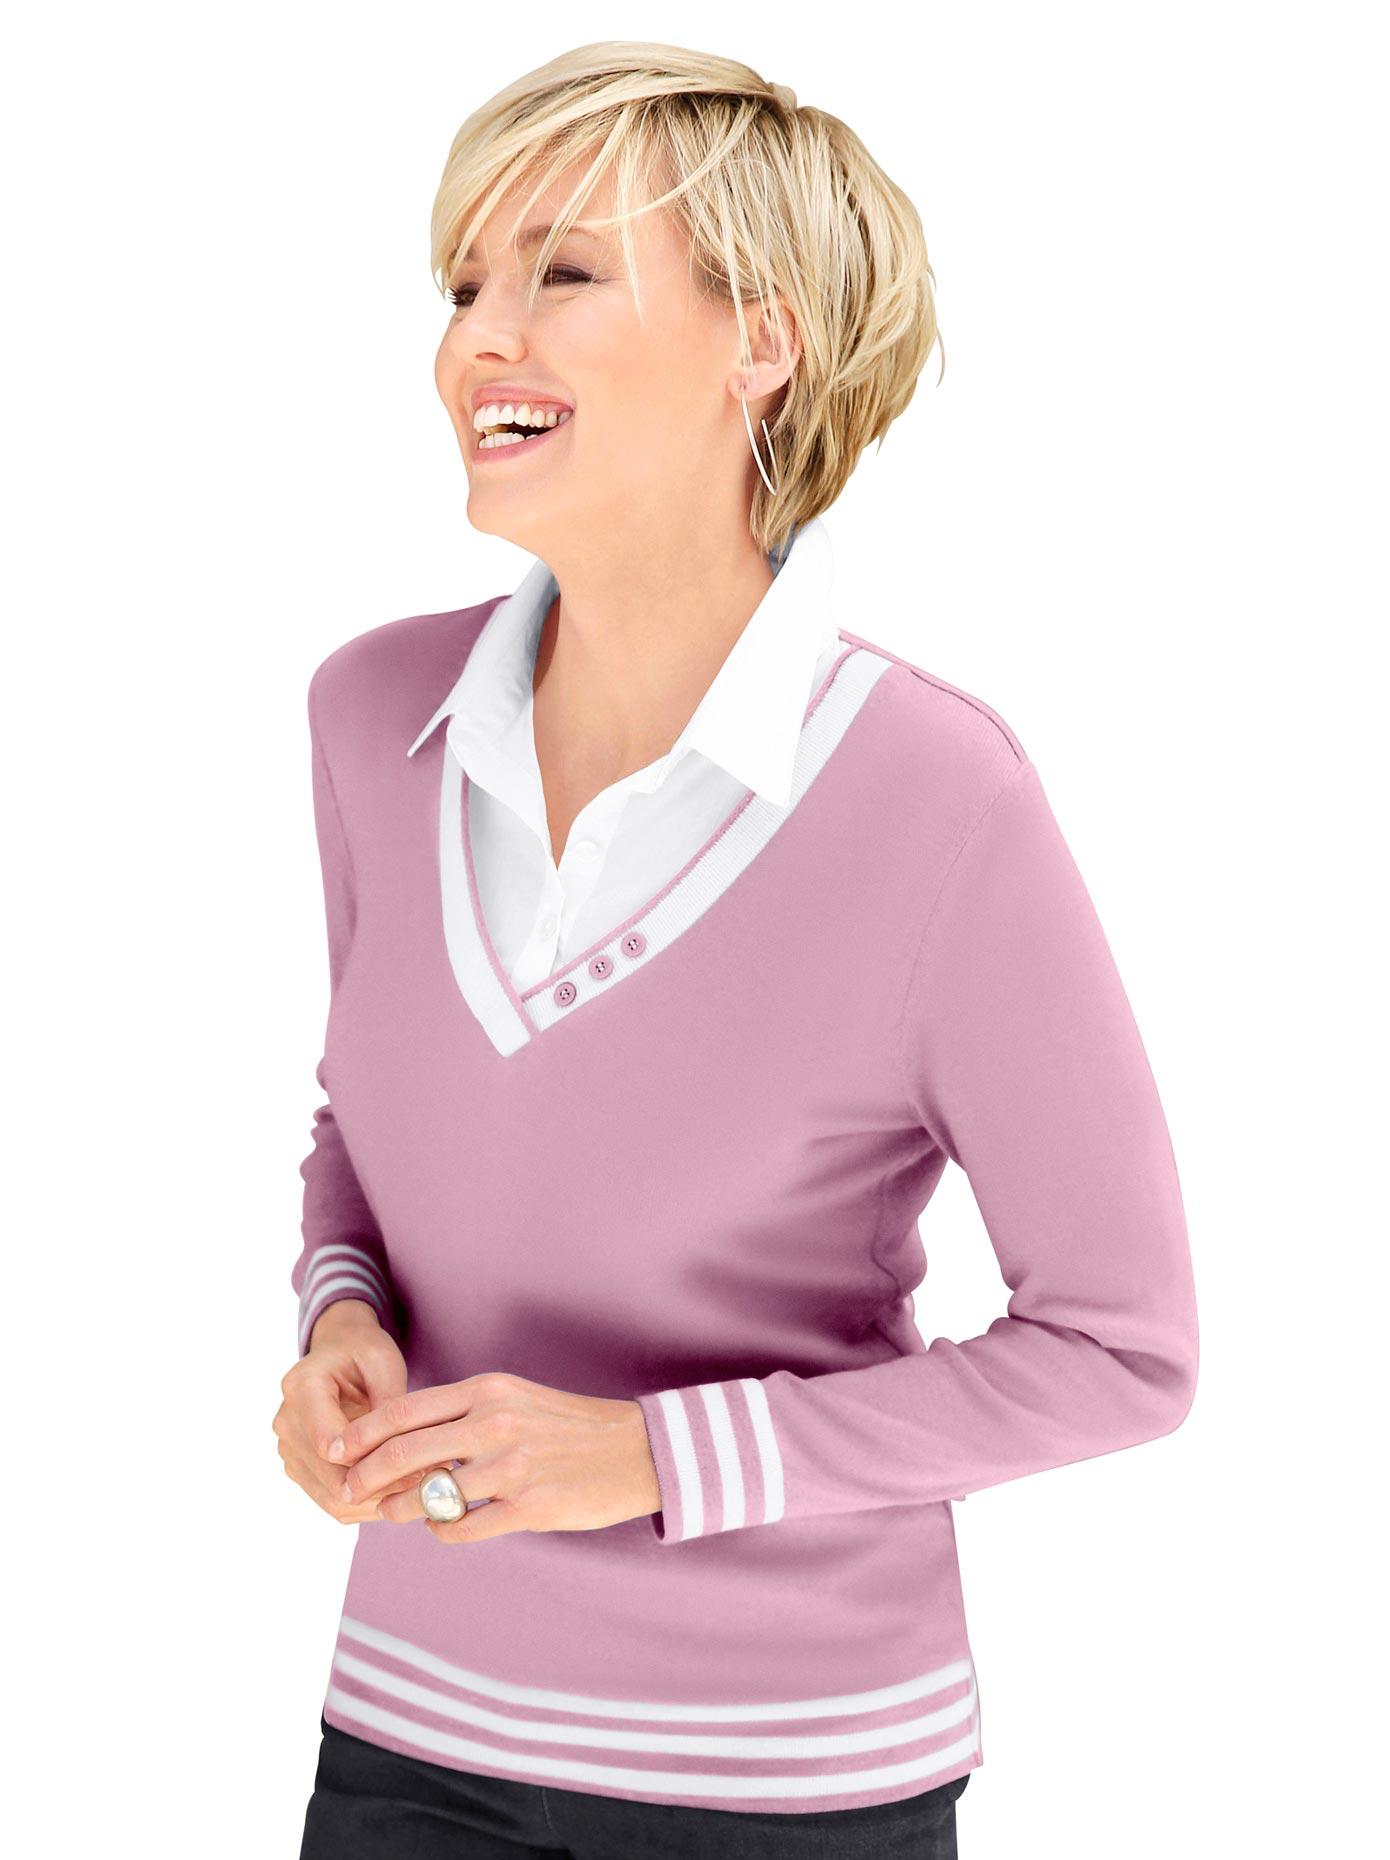 Casual Looks 2-in-1-Pullover mit Zierknöpfen am V-Ausschnitt   Bekleidung > Pullover > 2-in-1 Pullover   Lila   Casual Looks